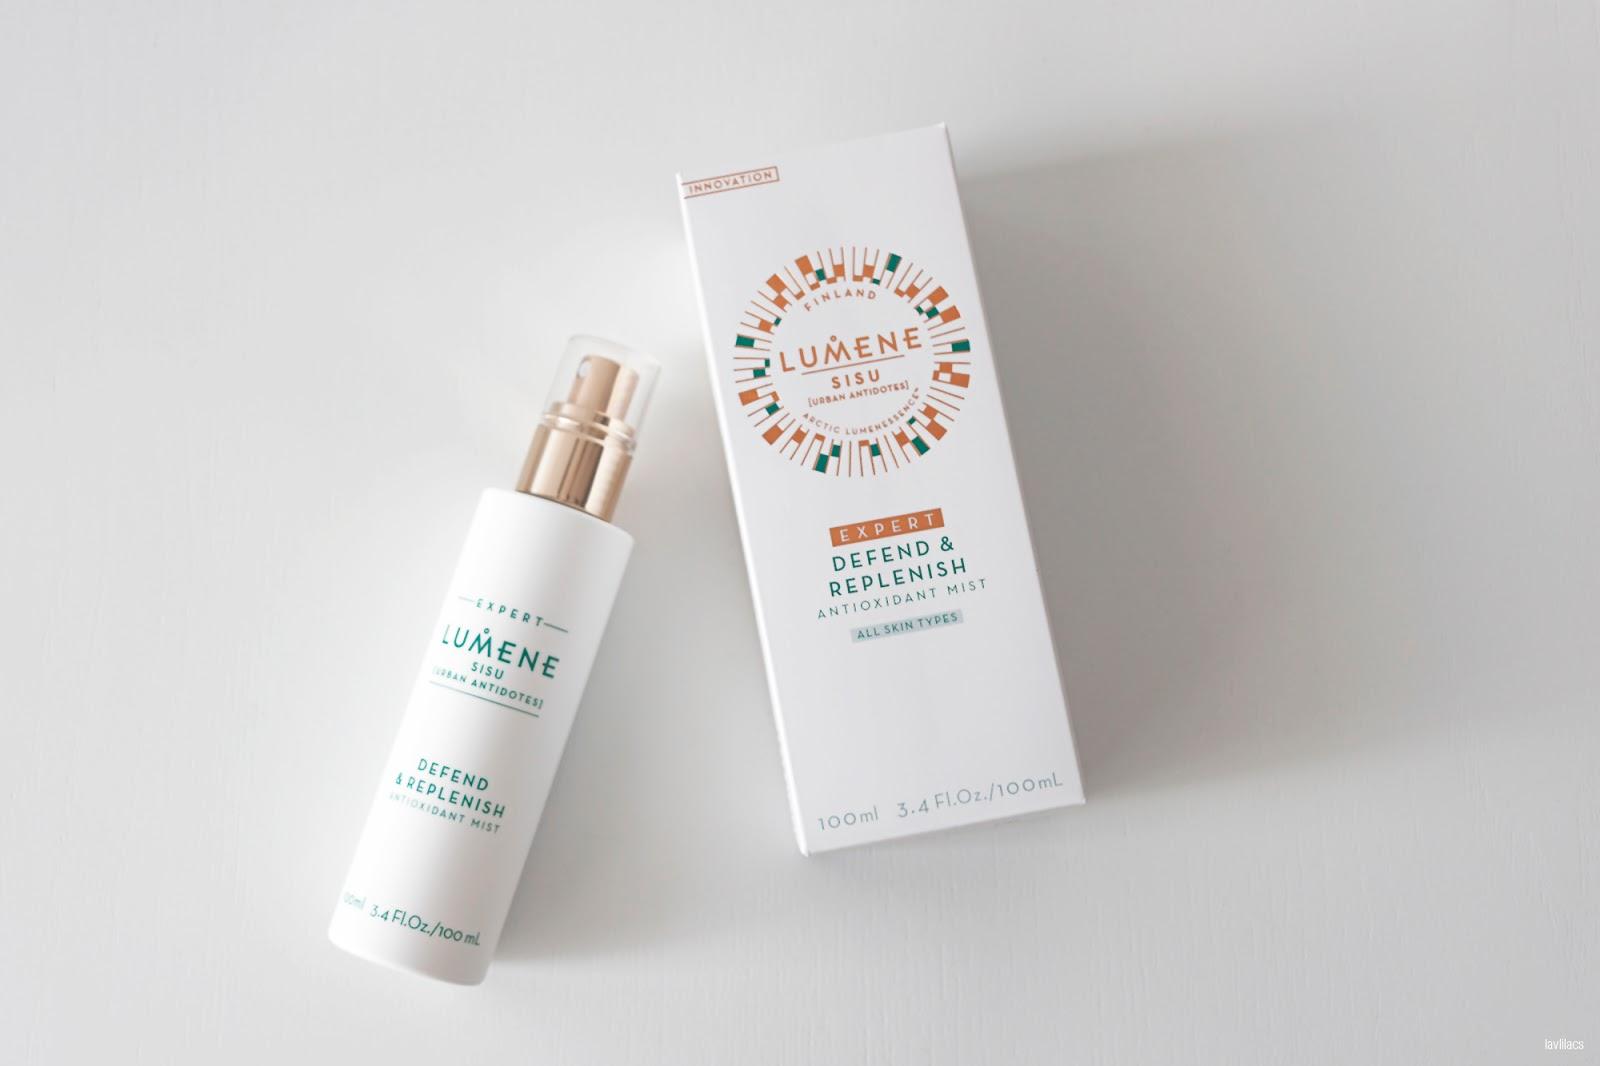 lavlilacs LUMENE Sisu Urban Antidotes Defend & Replenish Antioxidant Mist Review